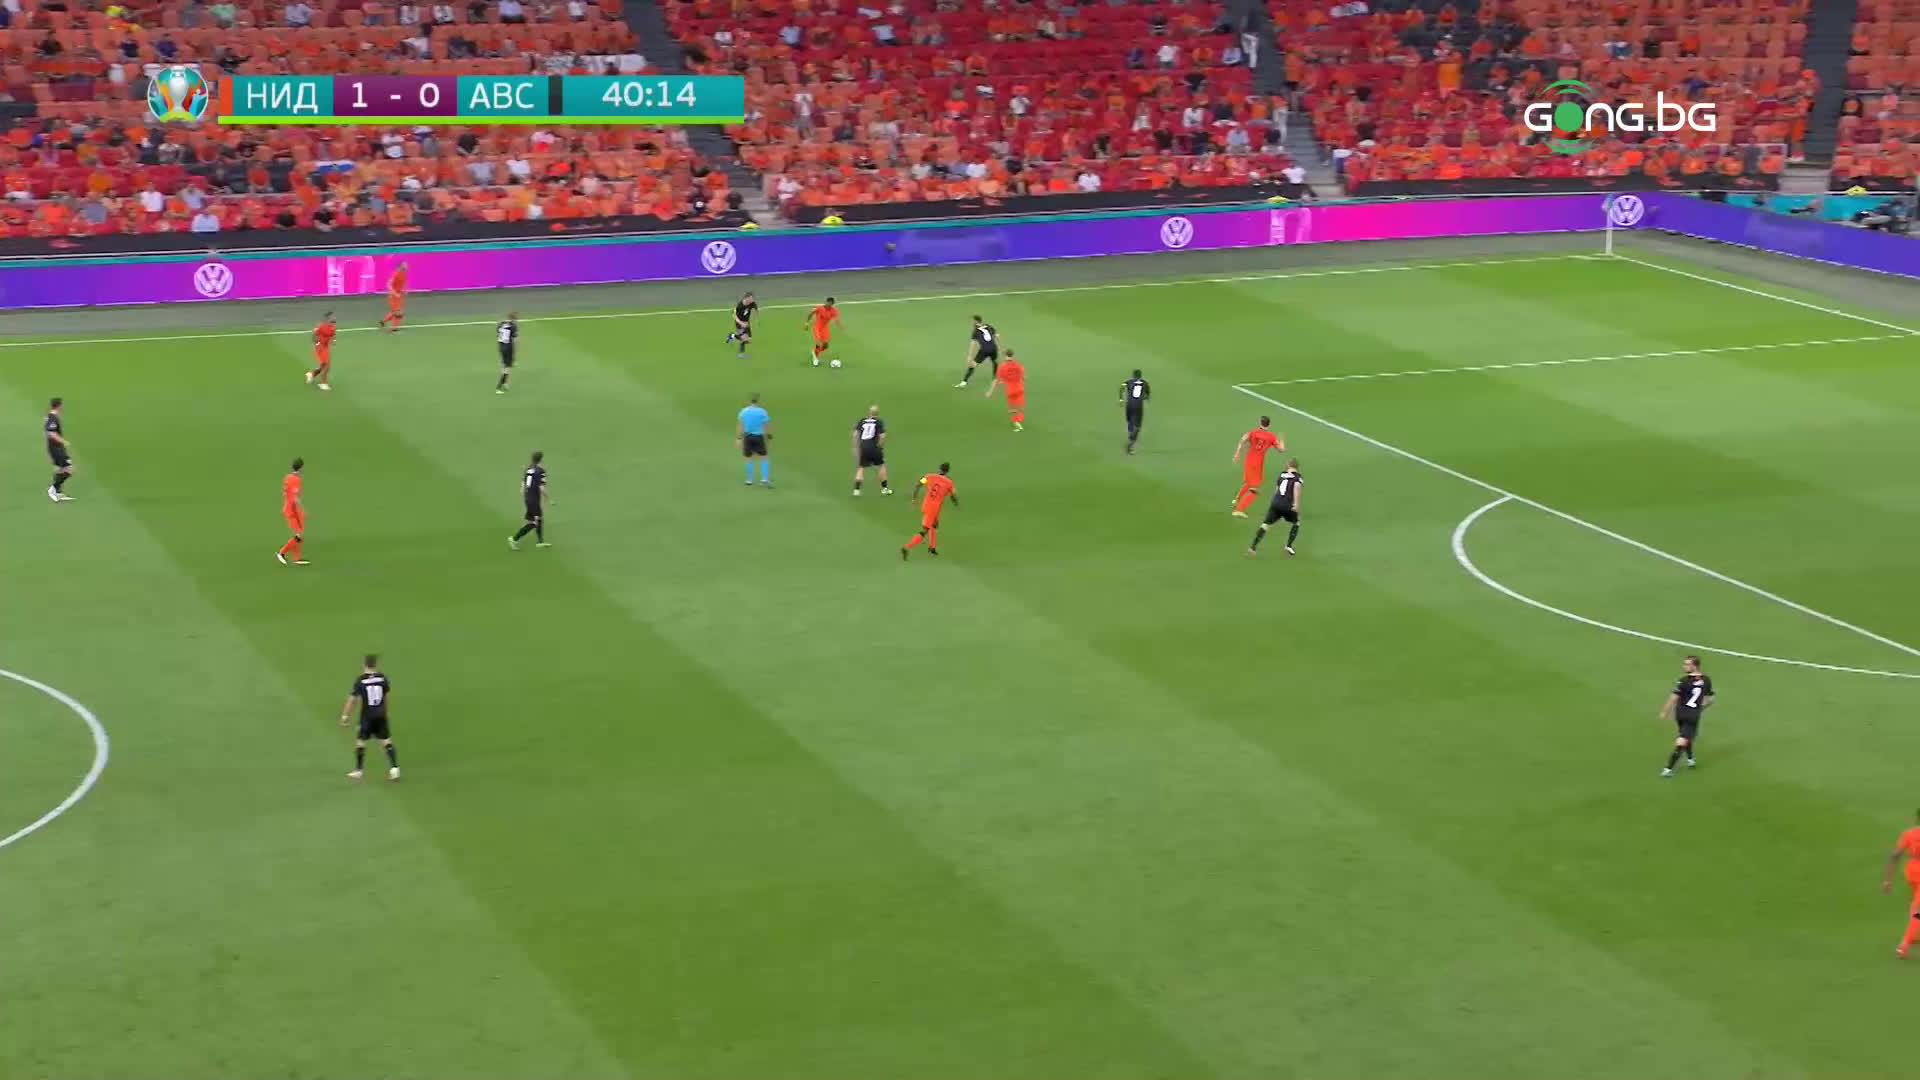 Нидерландия - Австрия 1:0 /първо полувреме/